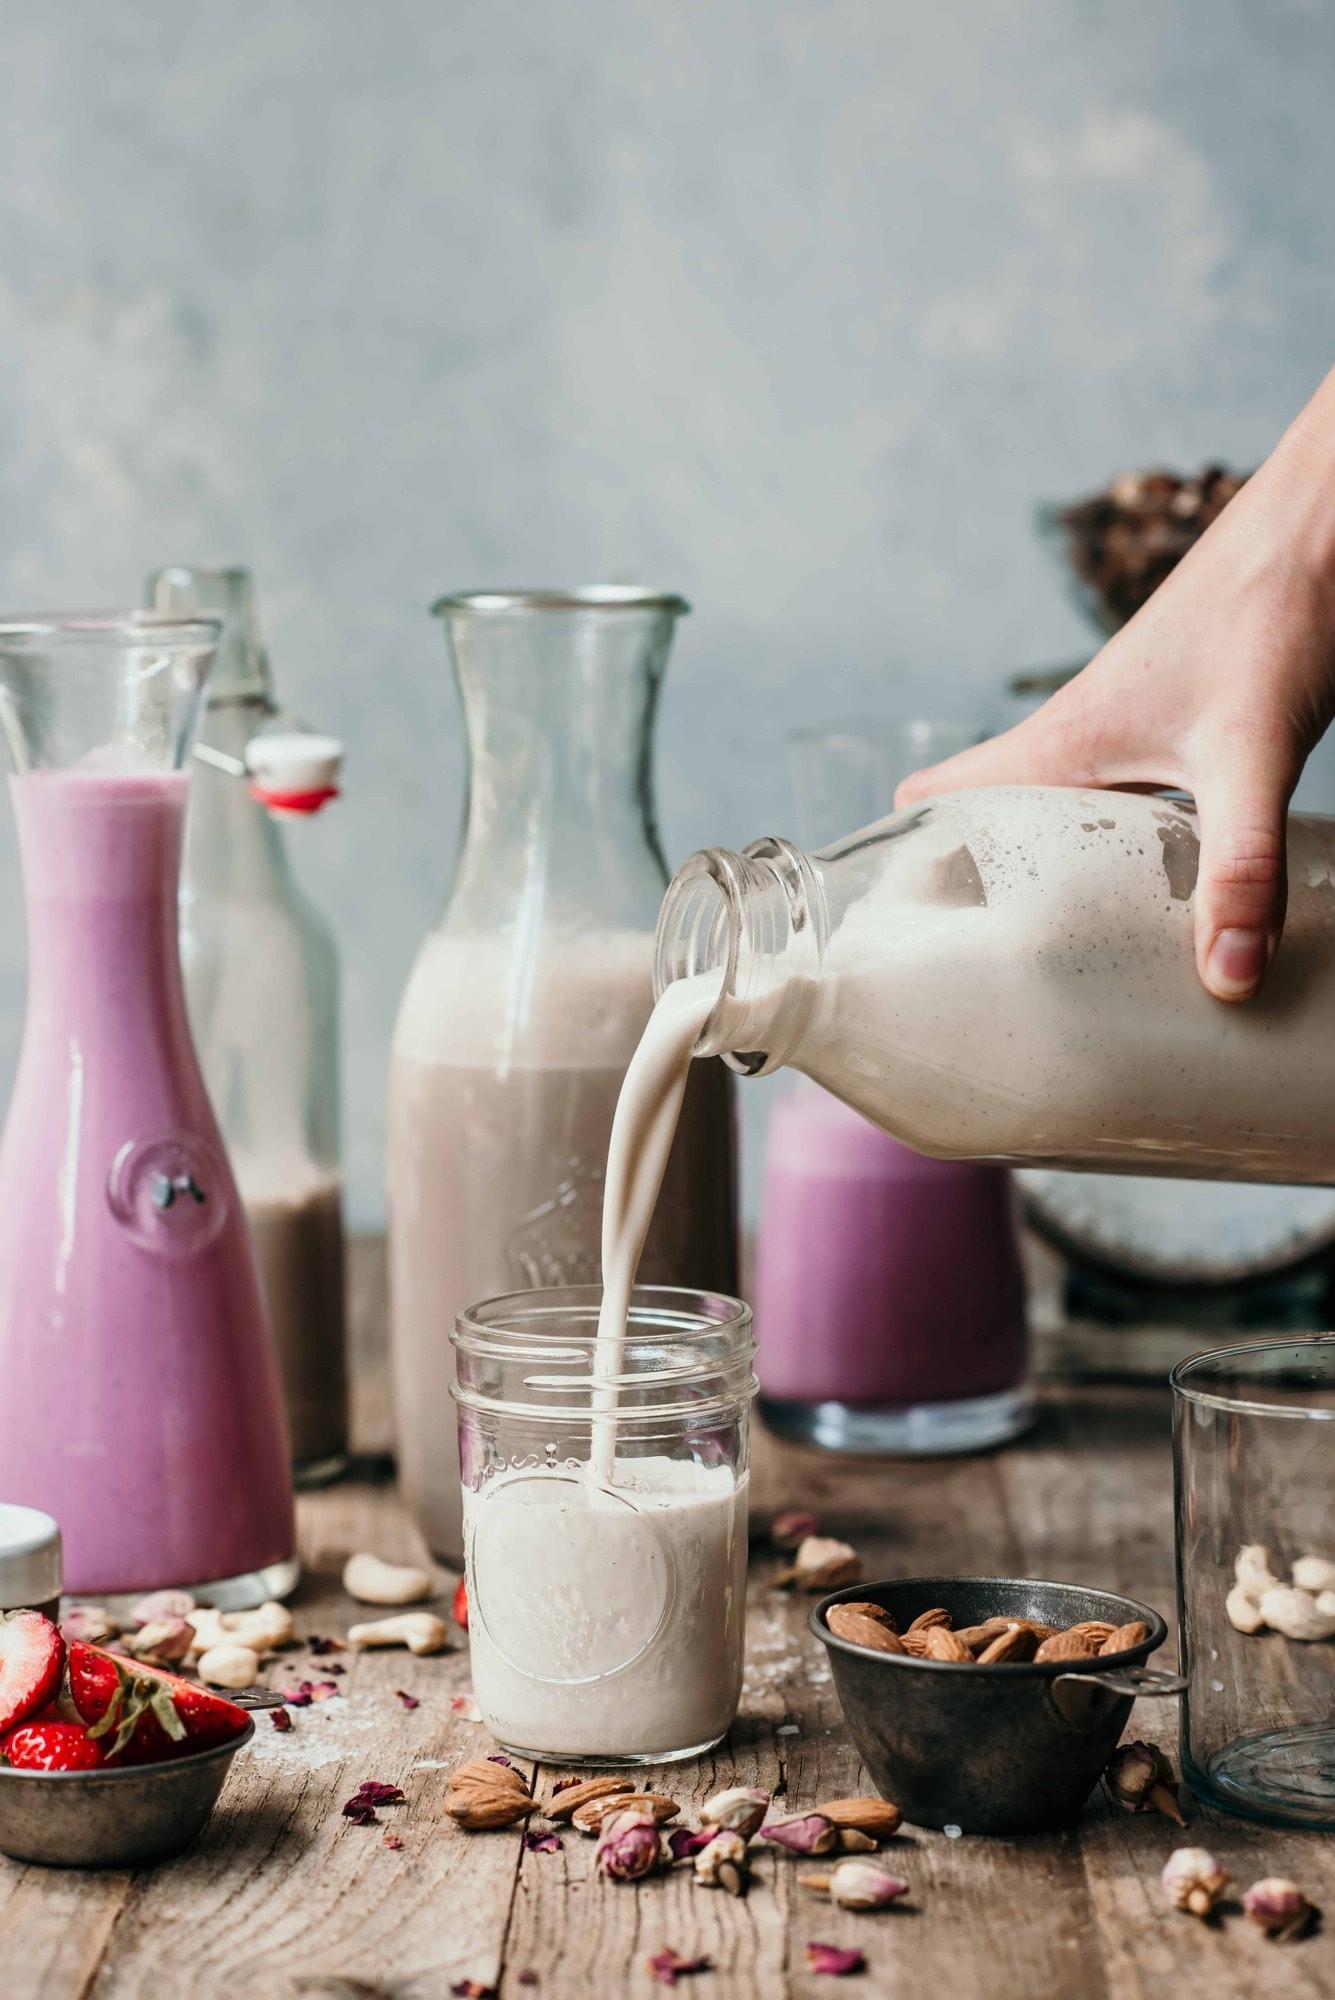 Pouring homemade vanilla almond milk into a glass jar